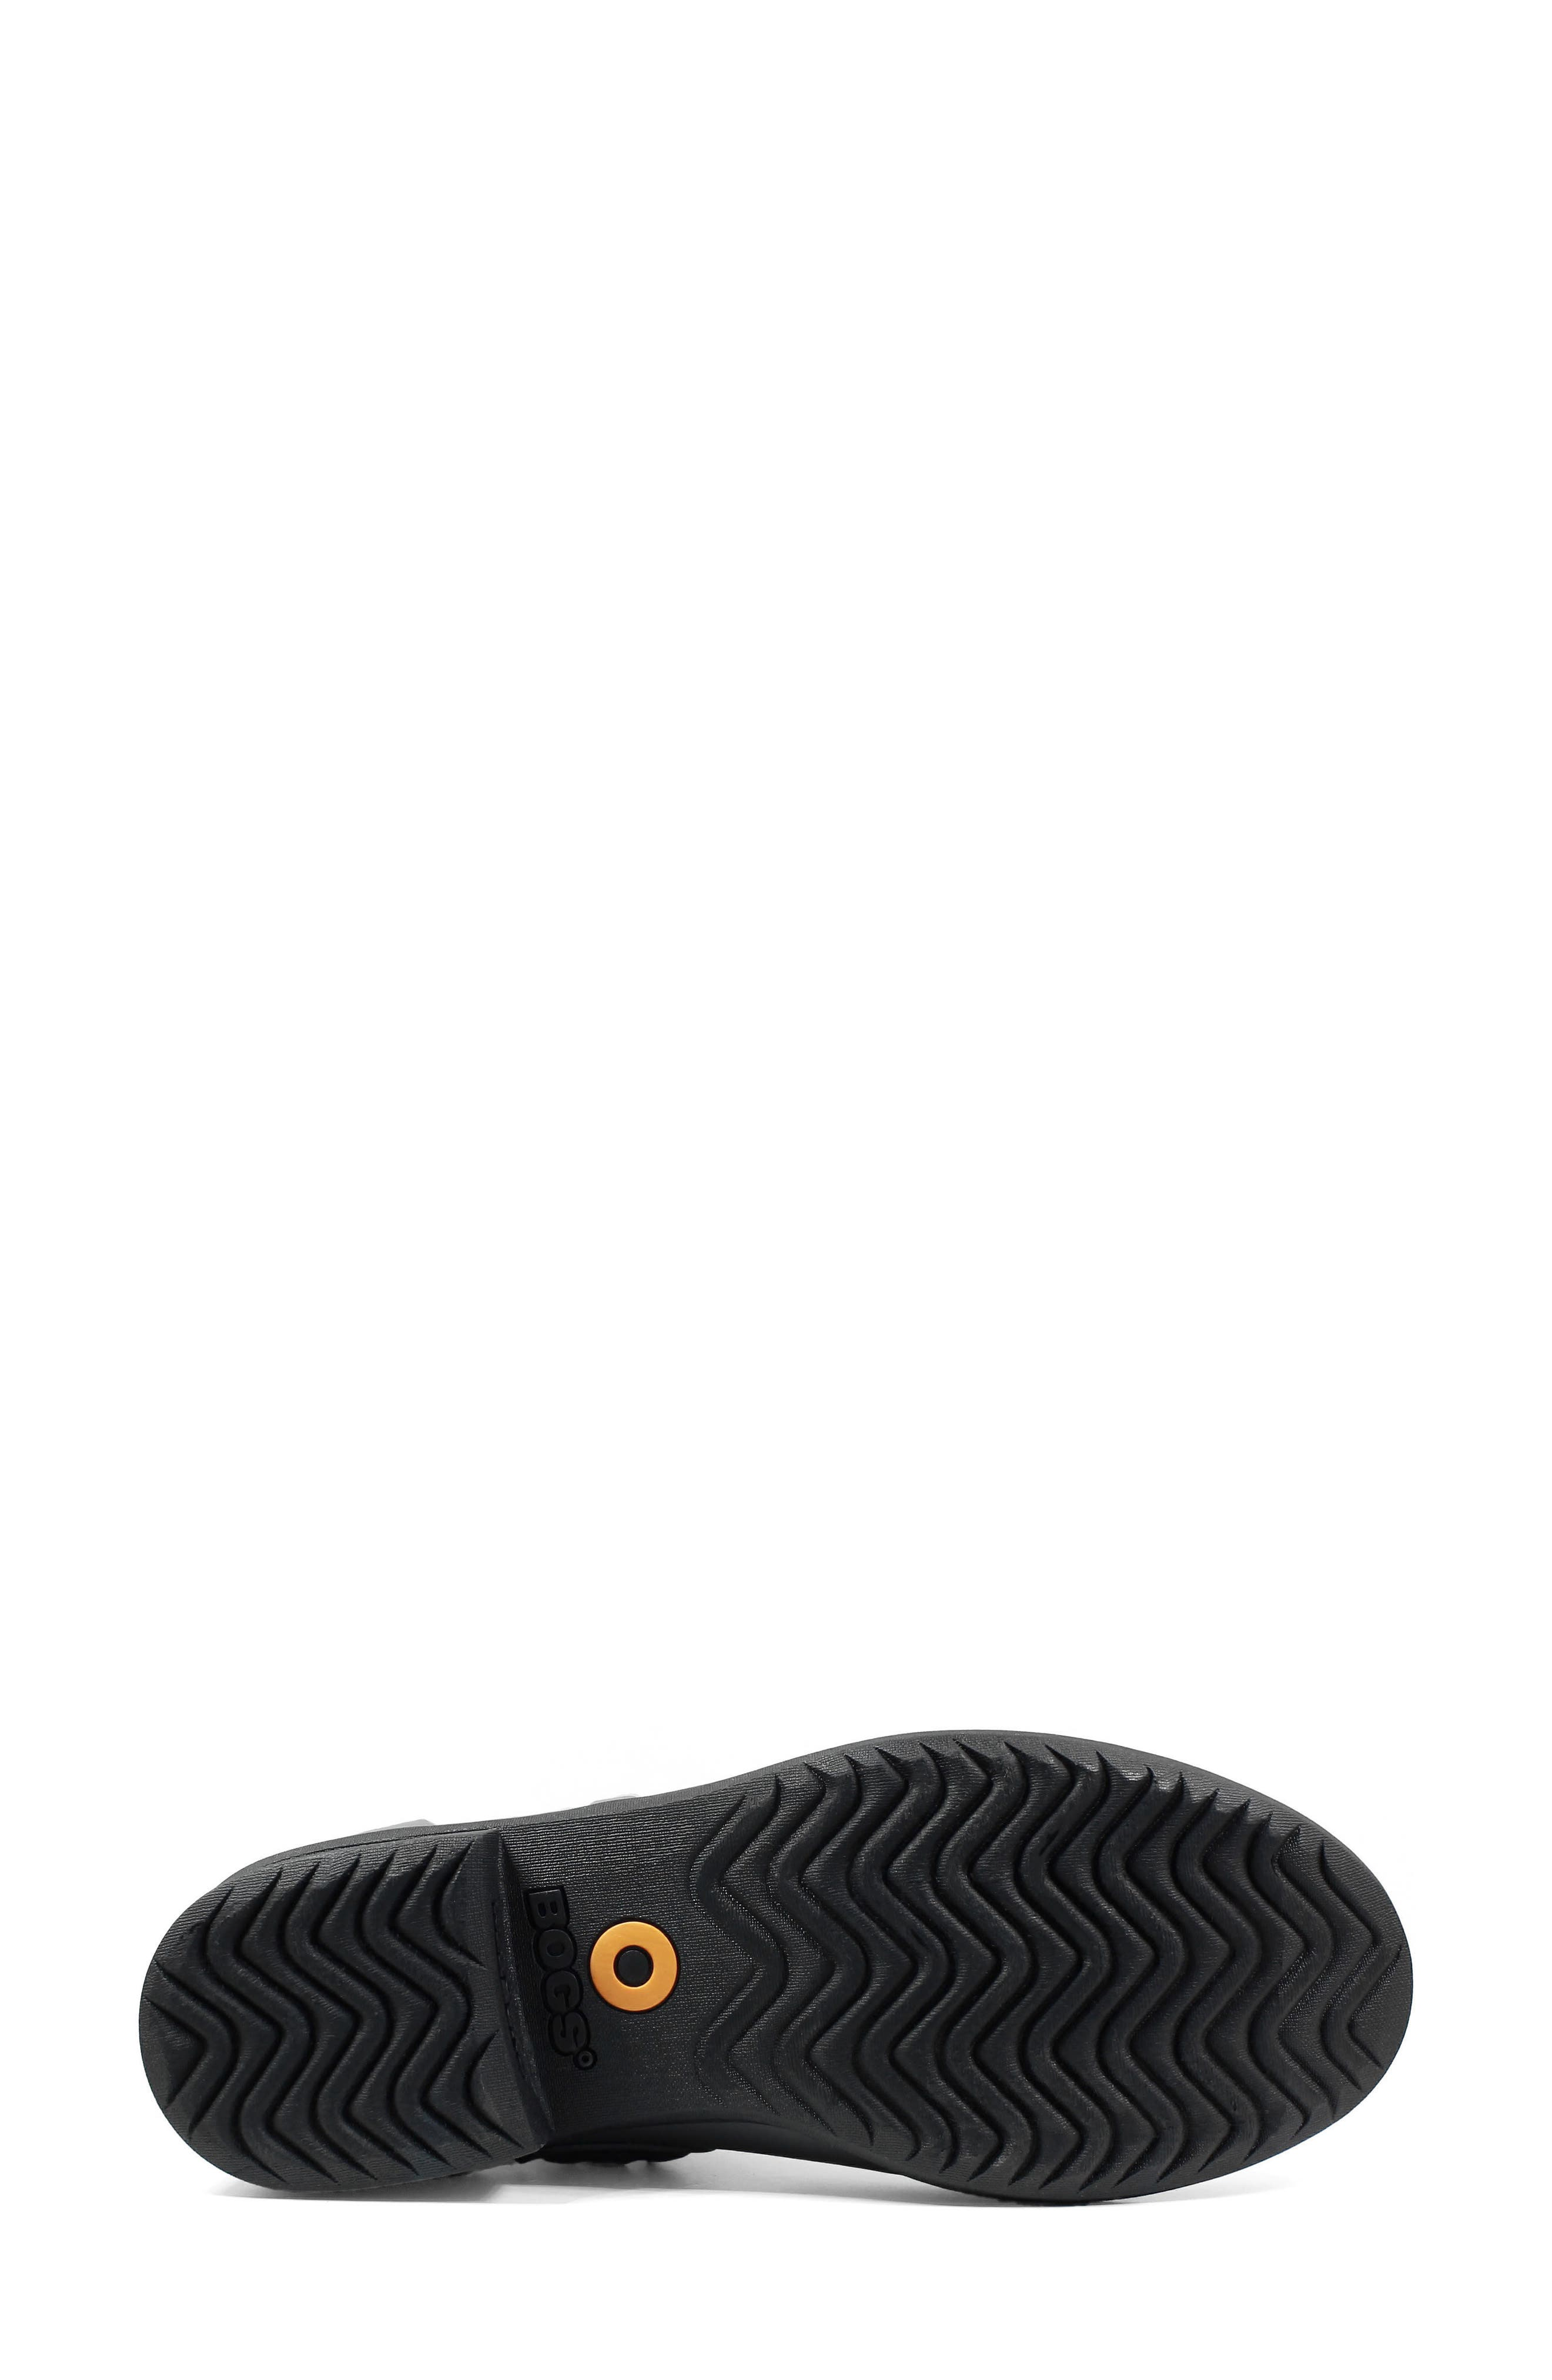 Auburn Insulated Waterproof Boot,                             Alternate thumbnail 6, color,                             Grey